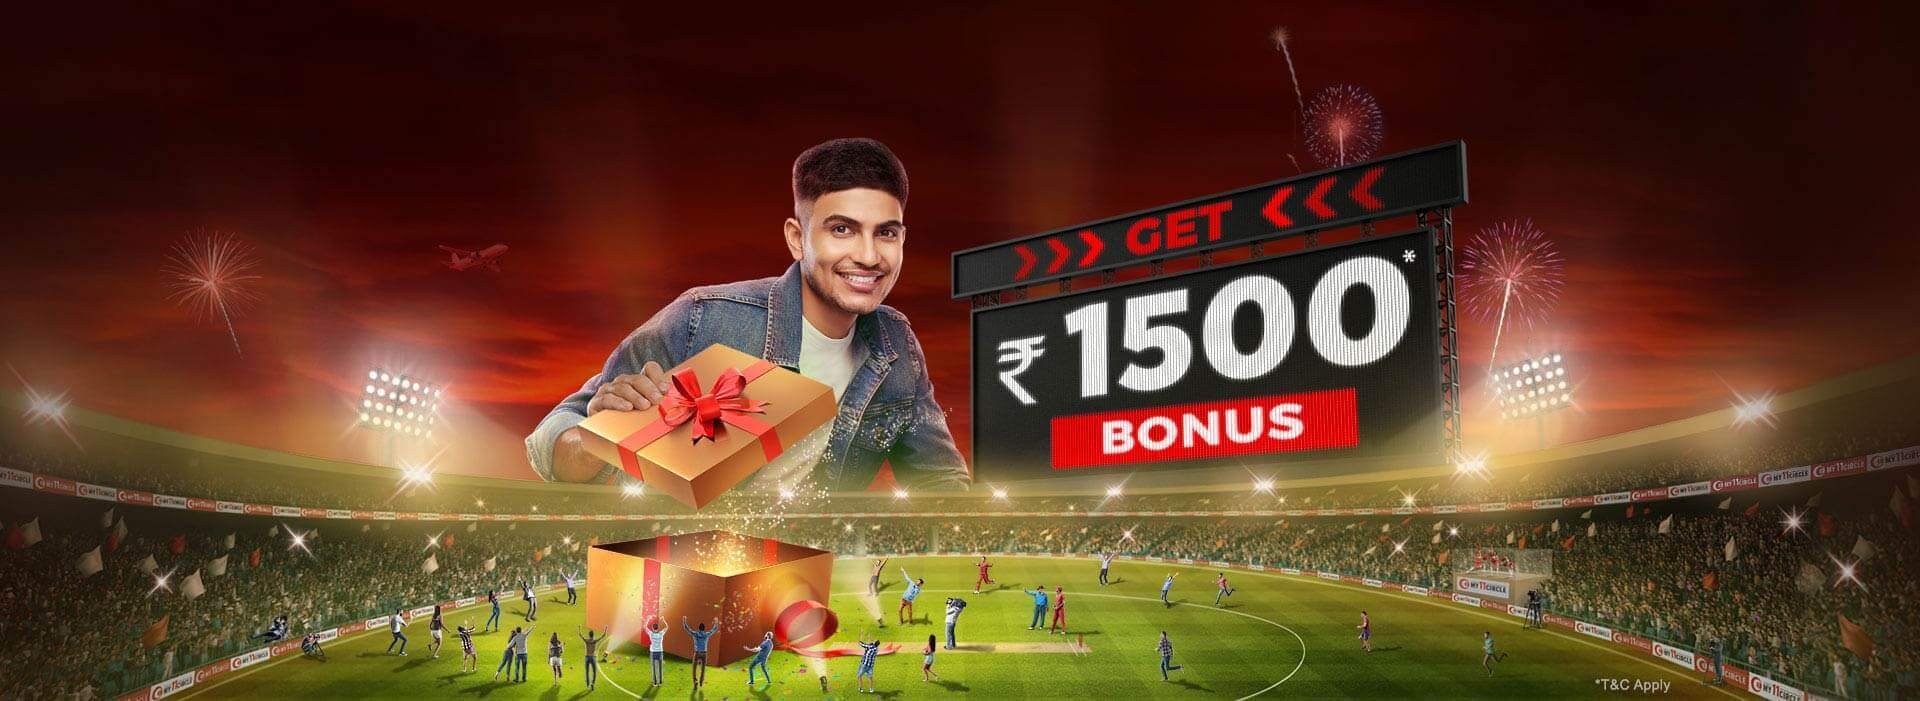 Get Rs. 1500* Bonus